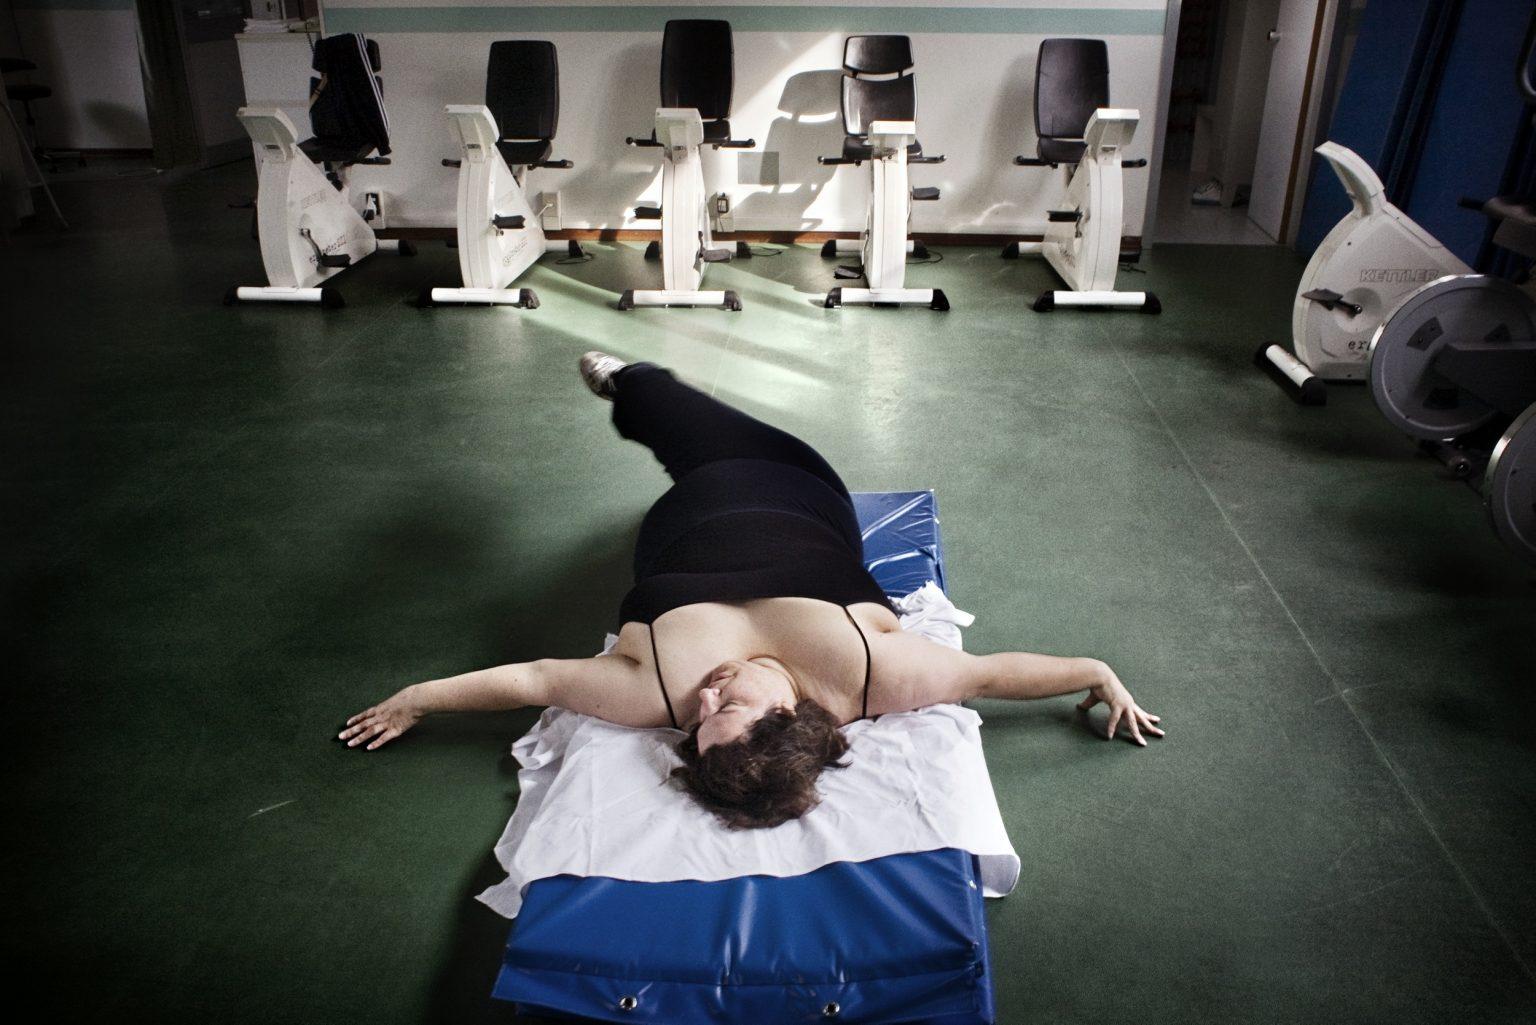 Villa Garda nursing home. Department of Eating and Weight Disorder. Angela doing exercises at the gym. Garda, Verona, Italy 2008